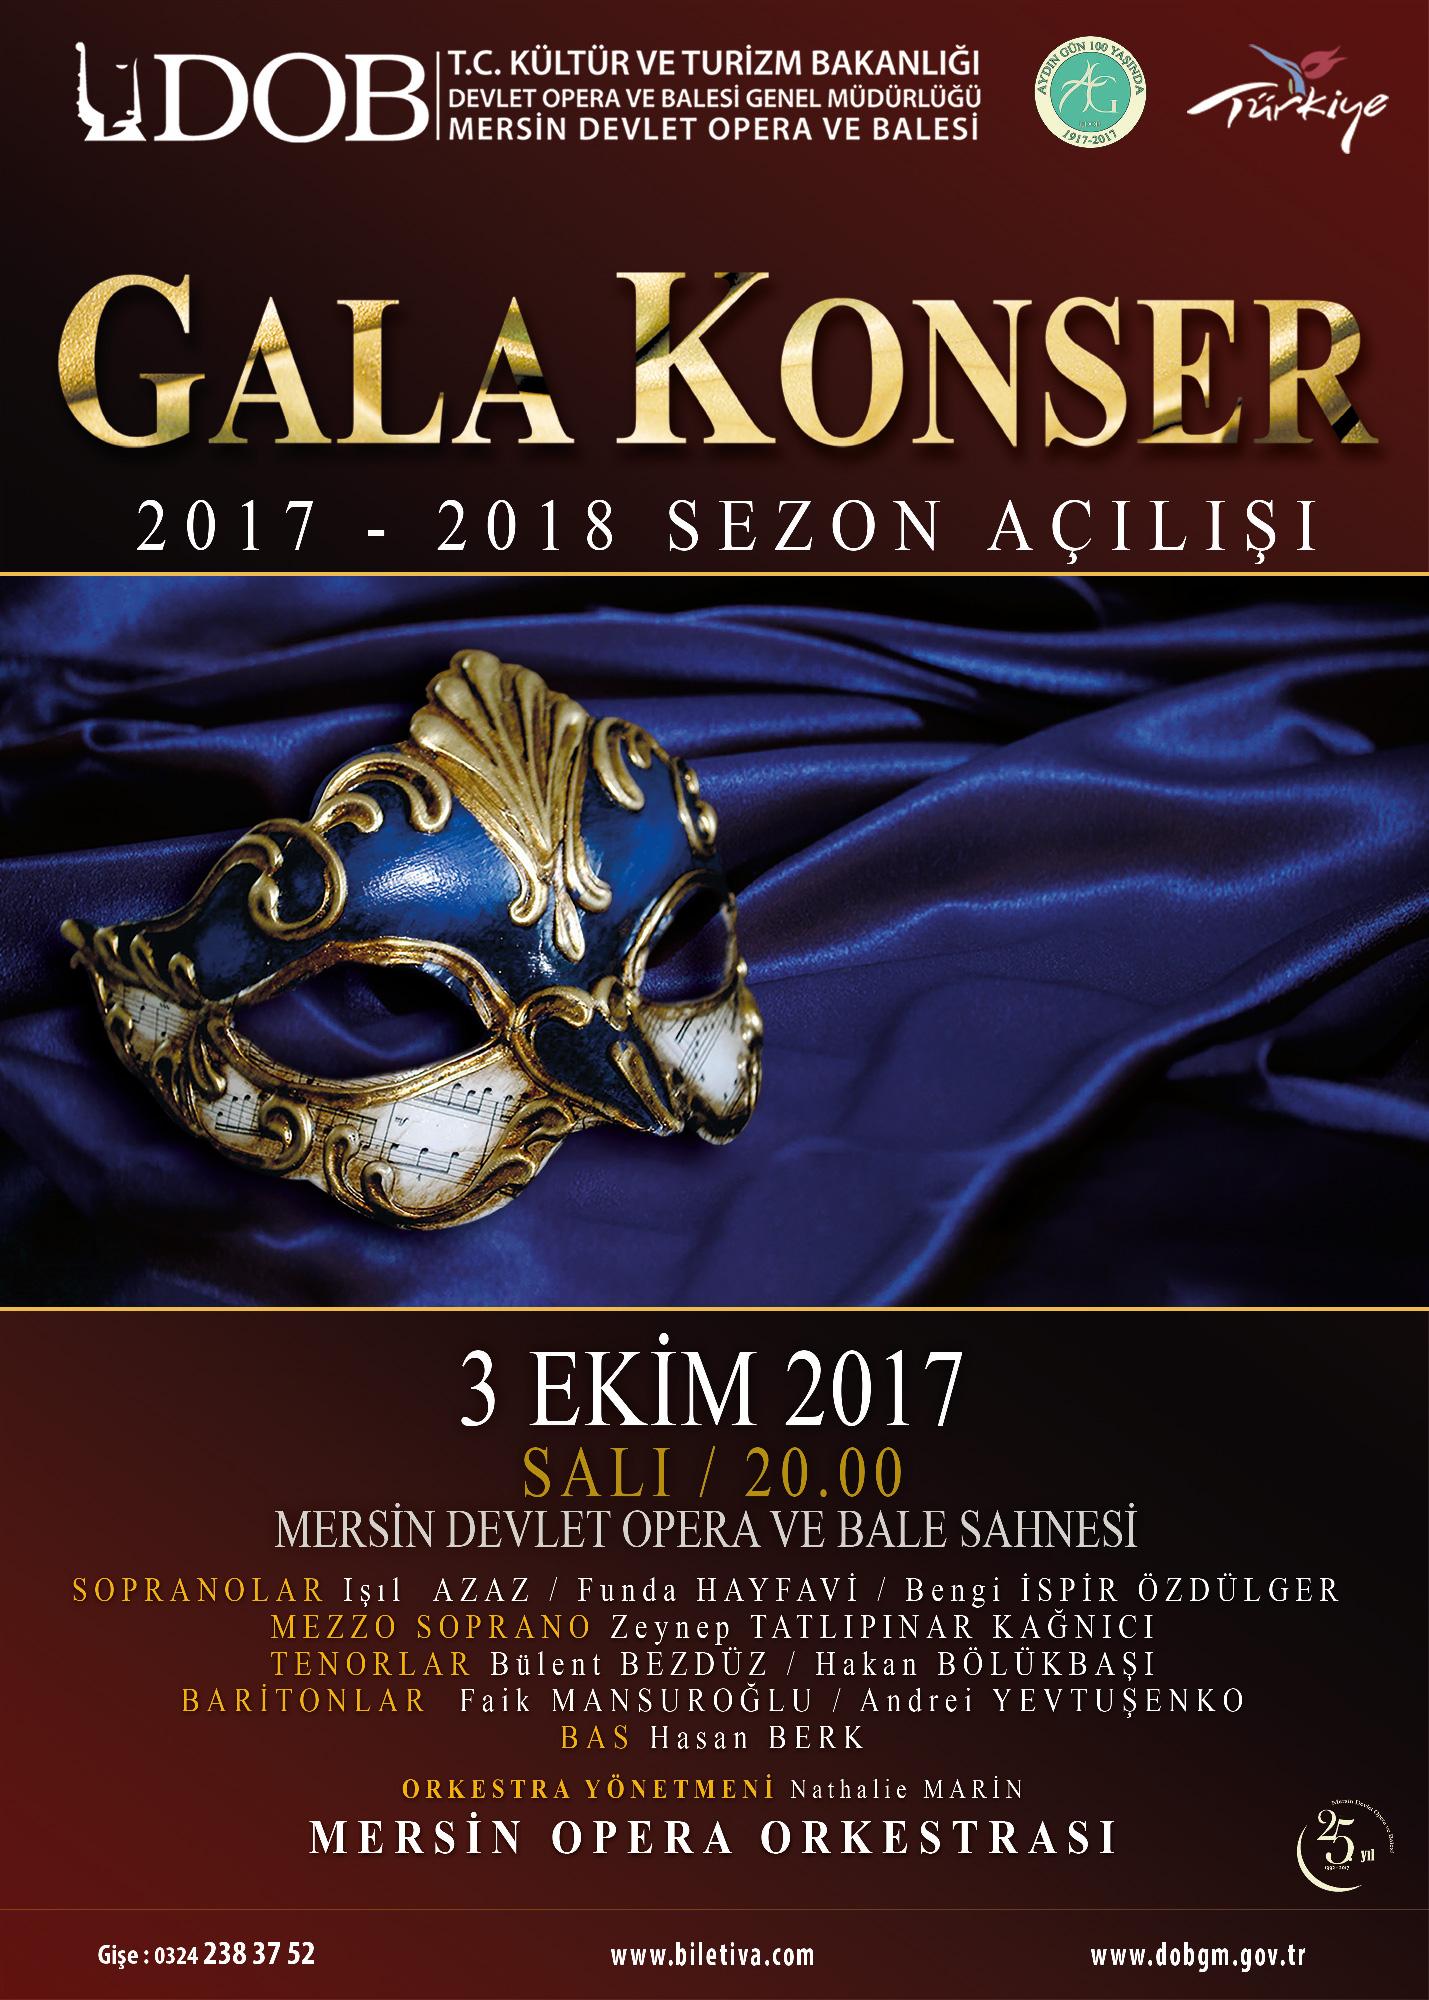 Gala Konser 2017-2018 Sezon Açılışı